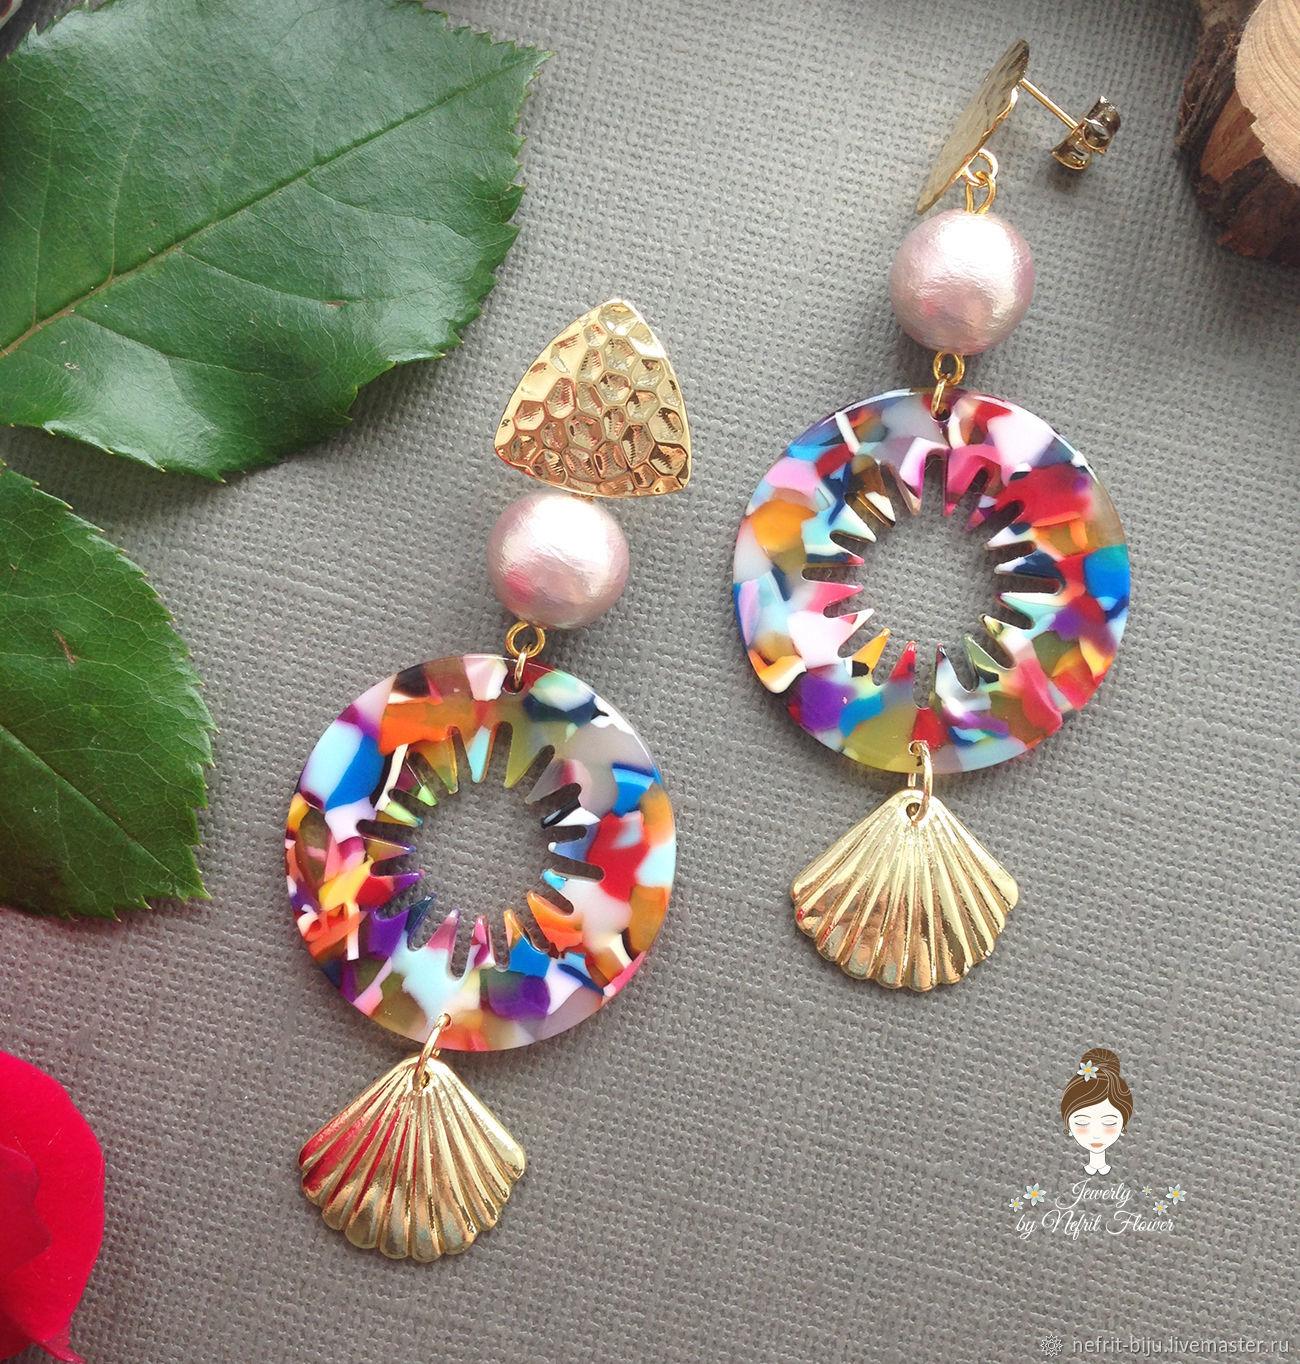 Spectacular bright stylish earrings 'Tropical Paradise' shells, Earrings, St. Petersburg,  Фото №1